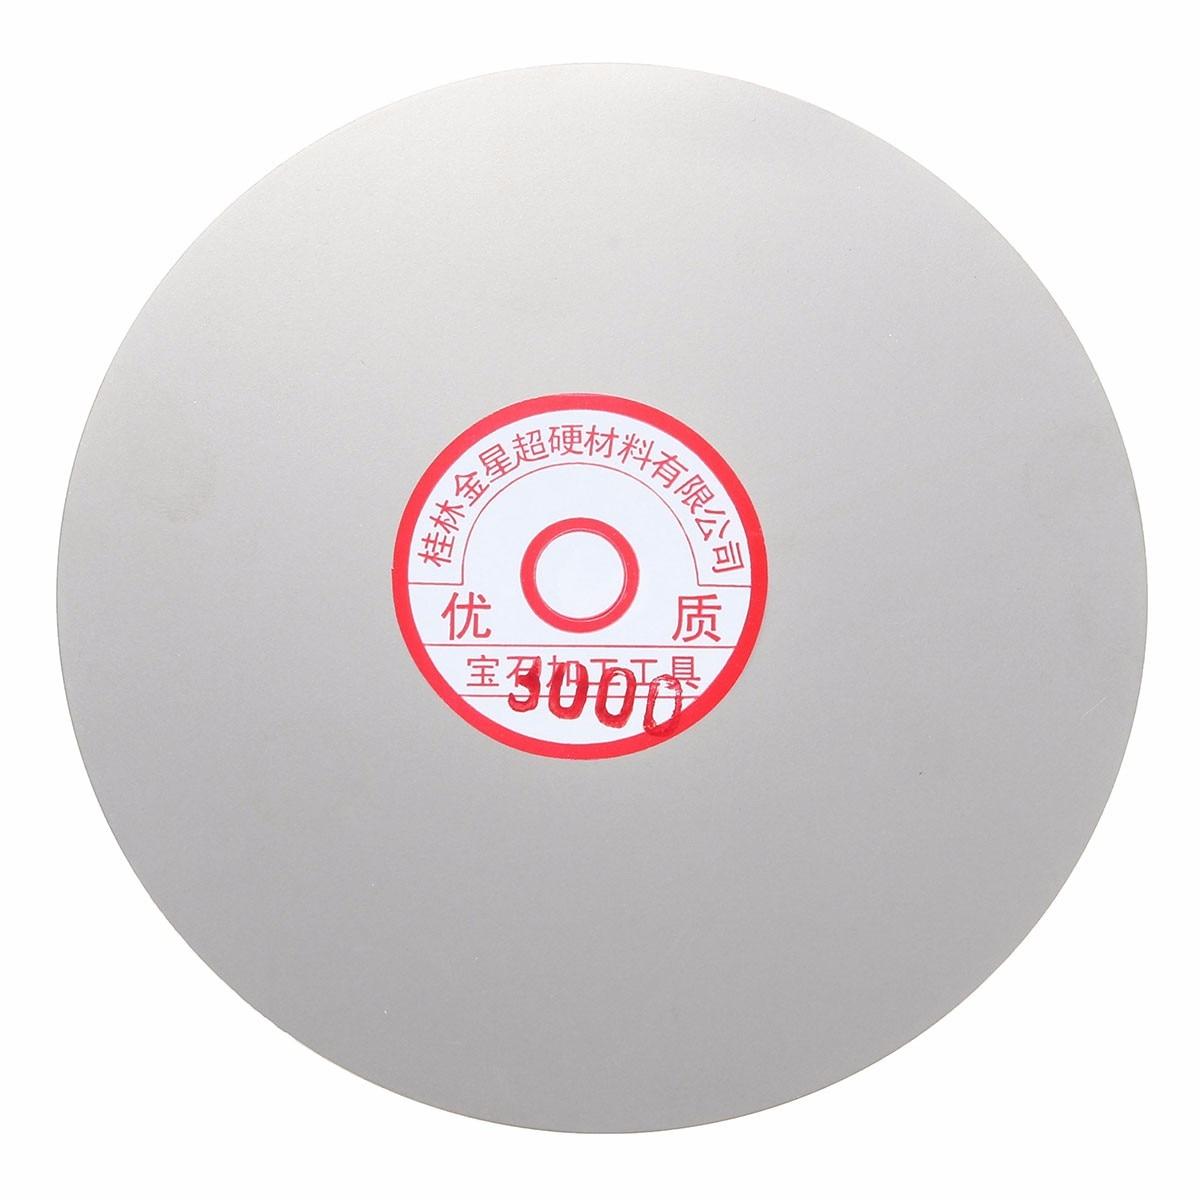 3pcs Polishing Wheel Disc Set 6'' 600 1500 3000 Grit Diamond Coated Flat Lap For Jewelry Glass Rock Diamond Coated Discs